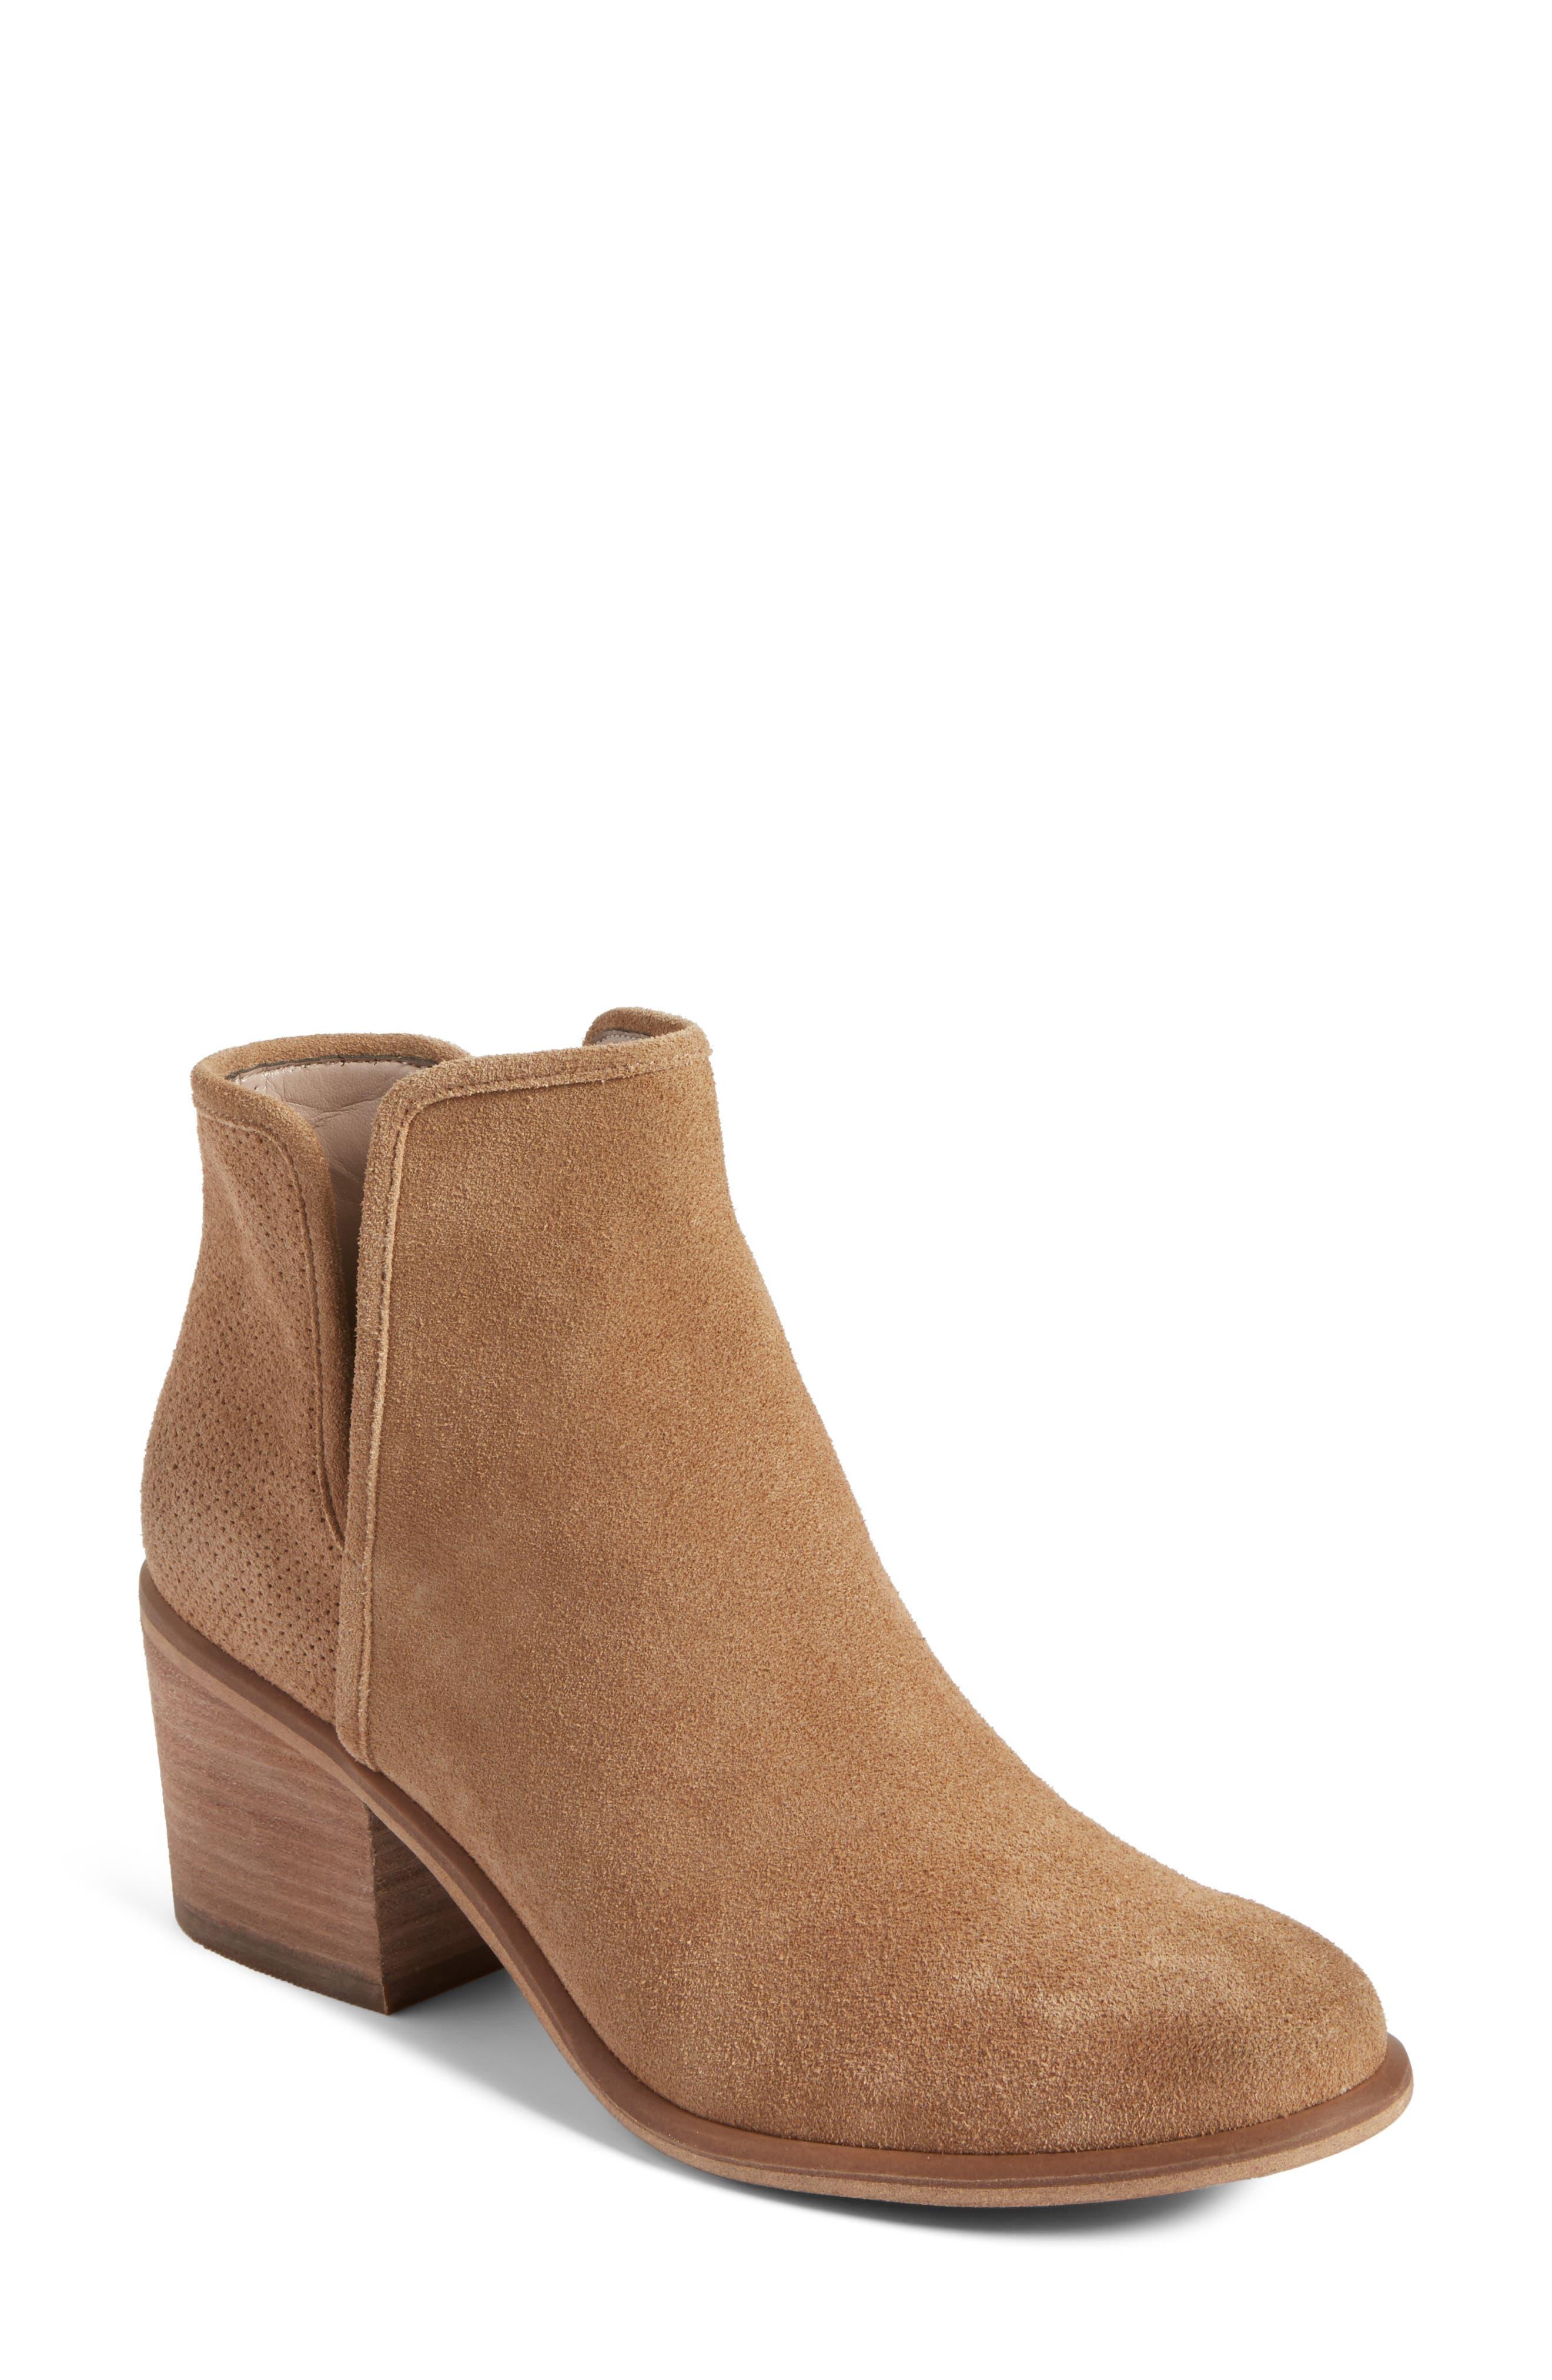 Barris Block Heel Bootie,                         Main,                         color, New Taupe Suede